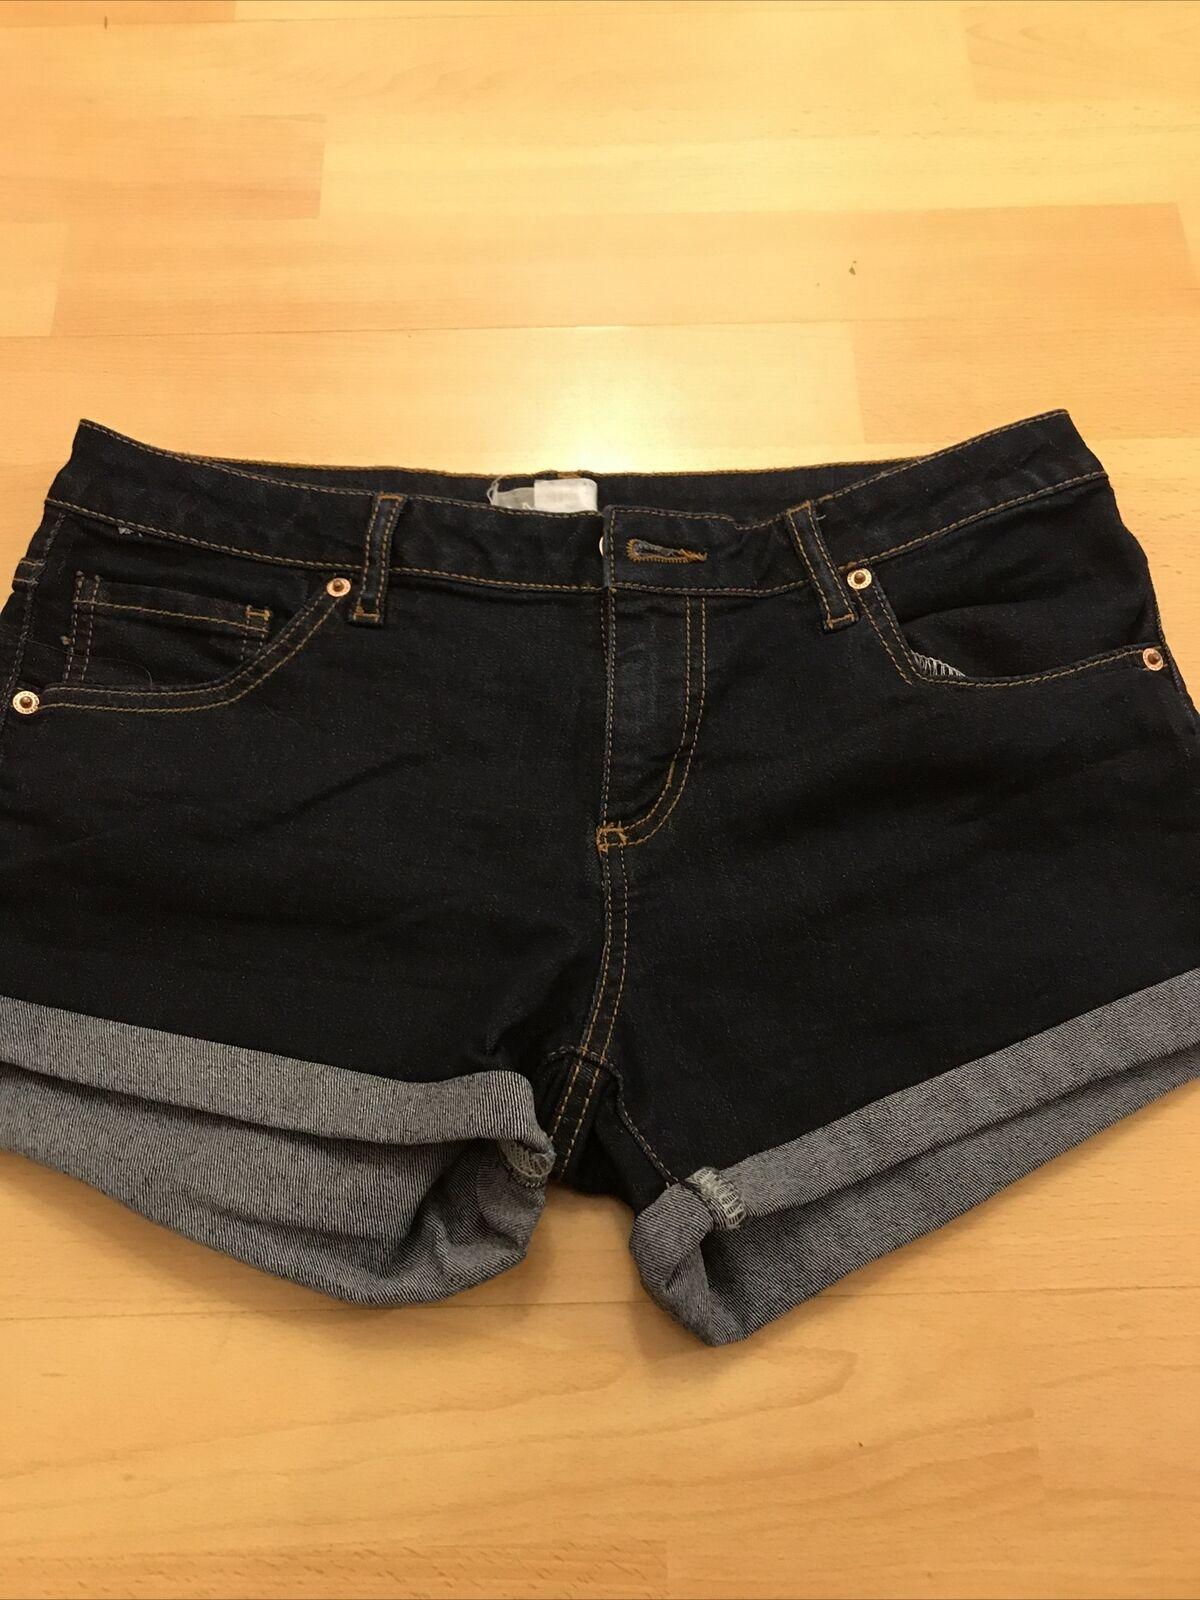 Dunkelblaue kurze Jeans Damen /SCHICK!